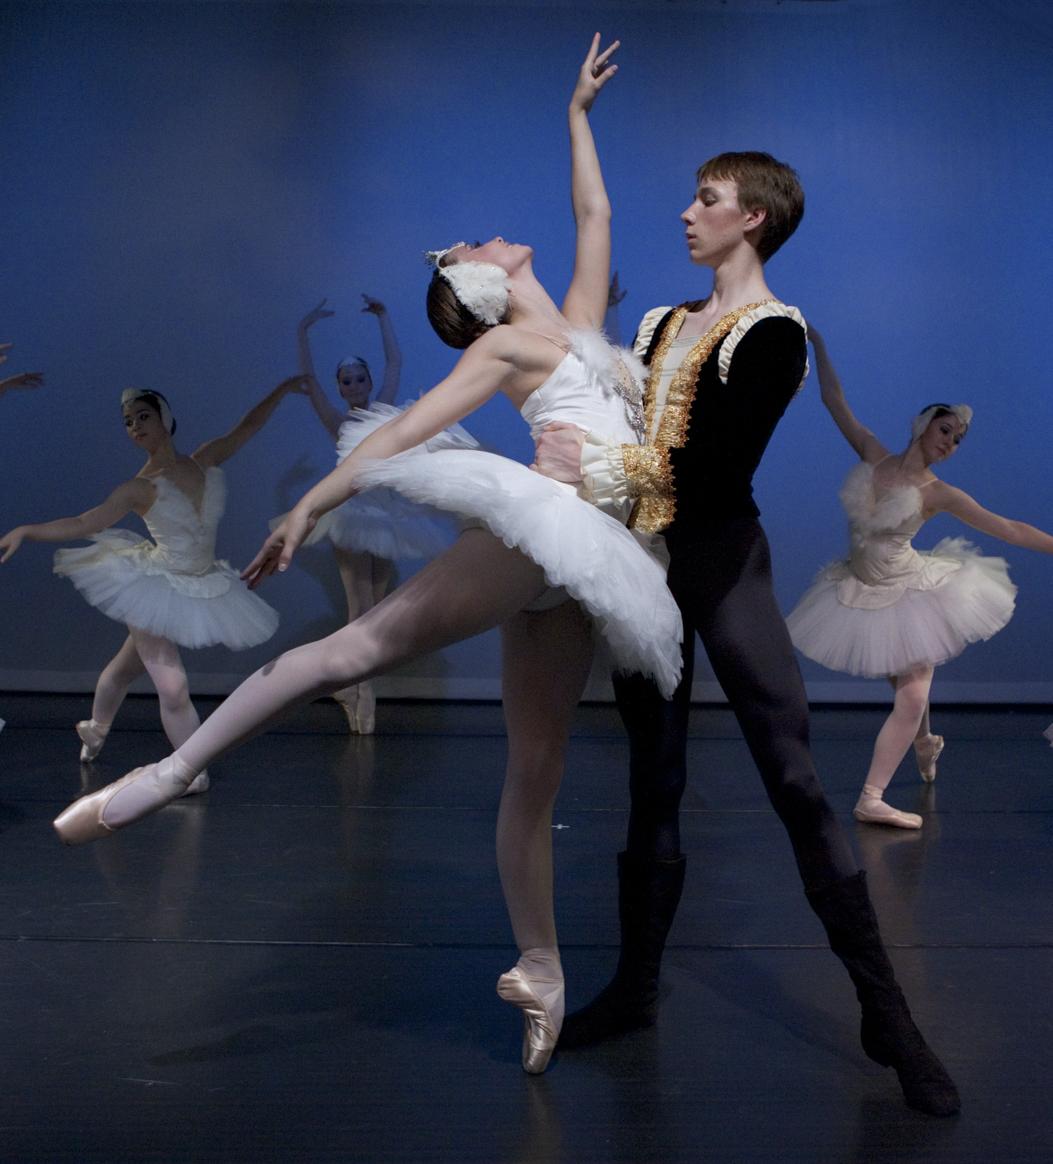 Swan Lake Pas de Deux   photo credit - Blaine Truitt Covert Dancers Maggie Rupp & Peter Deffebach